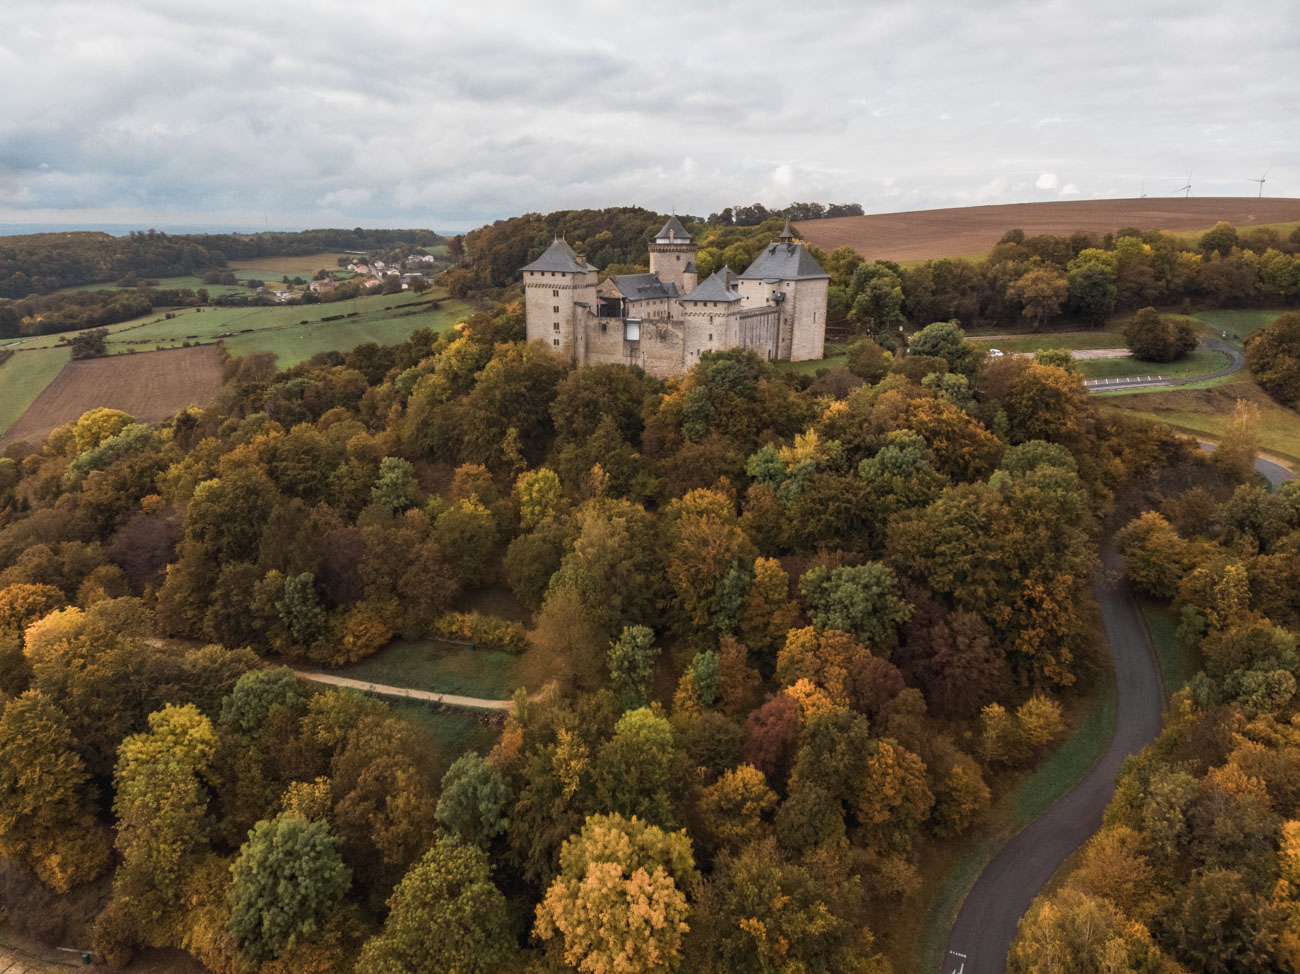 lotaryngia-chateau-de-malbrouck